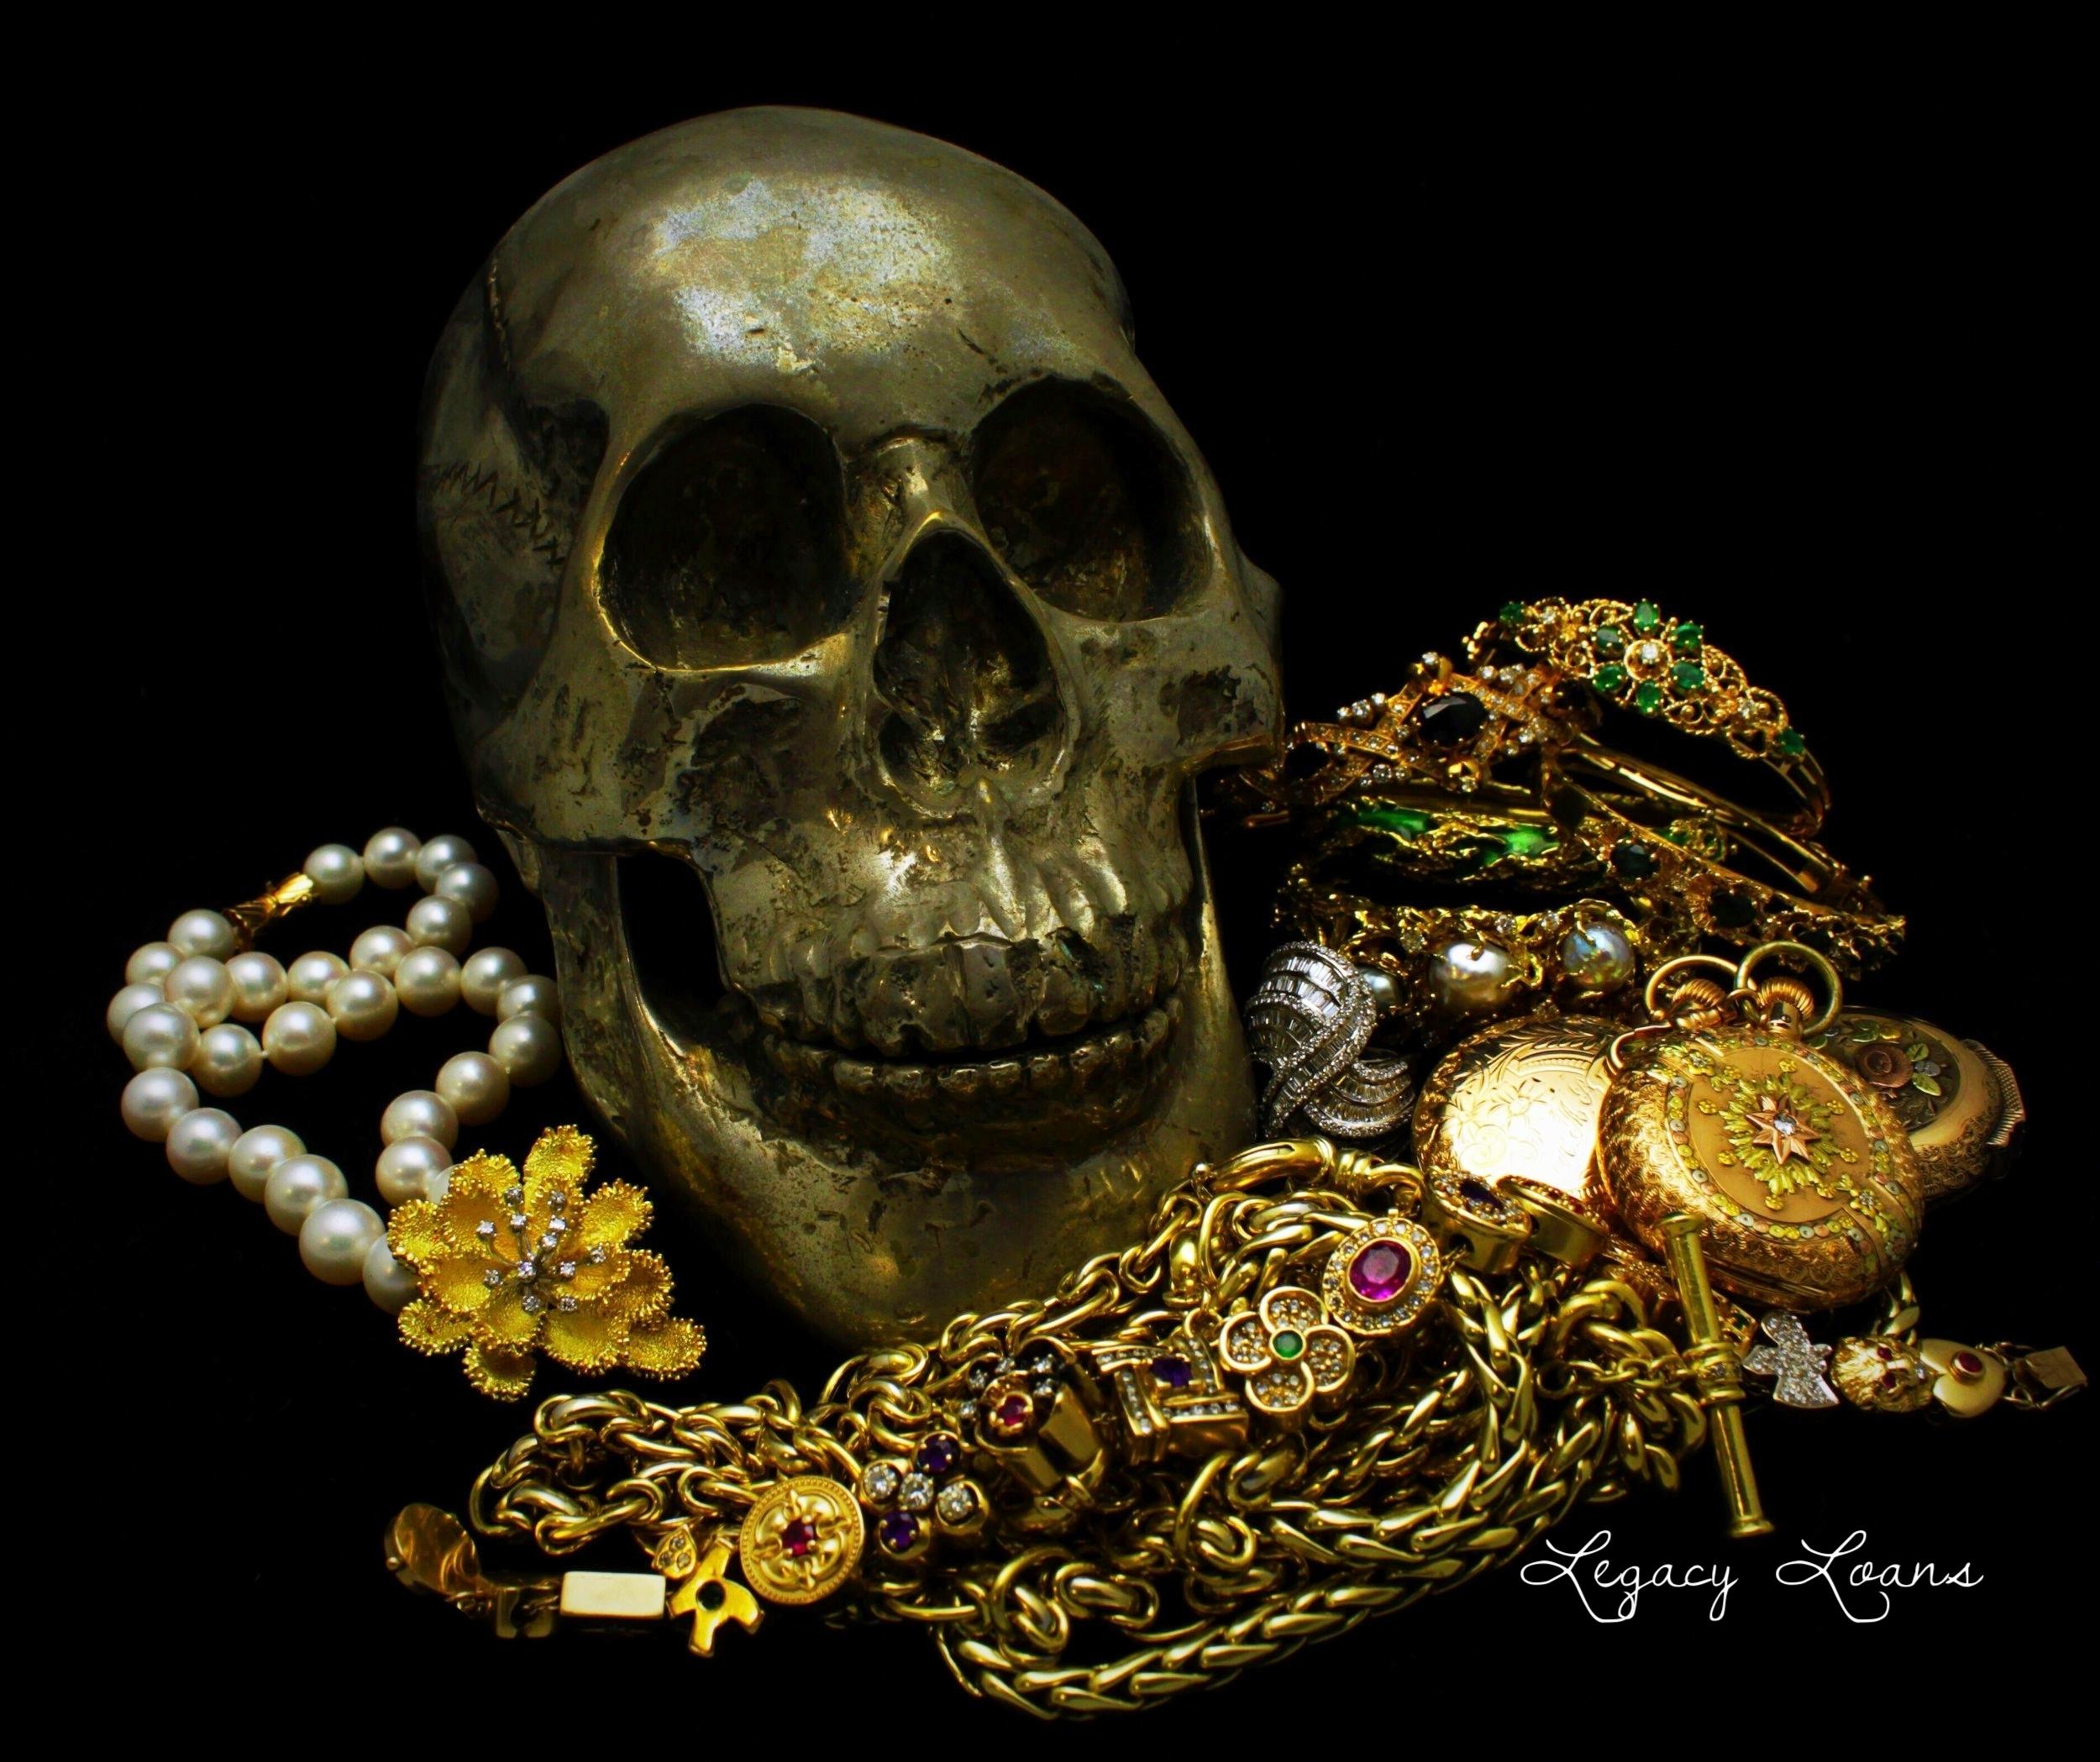 Legacy Jewelry & Legacy Loans